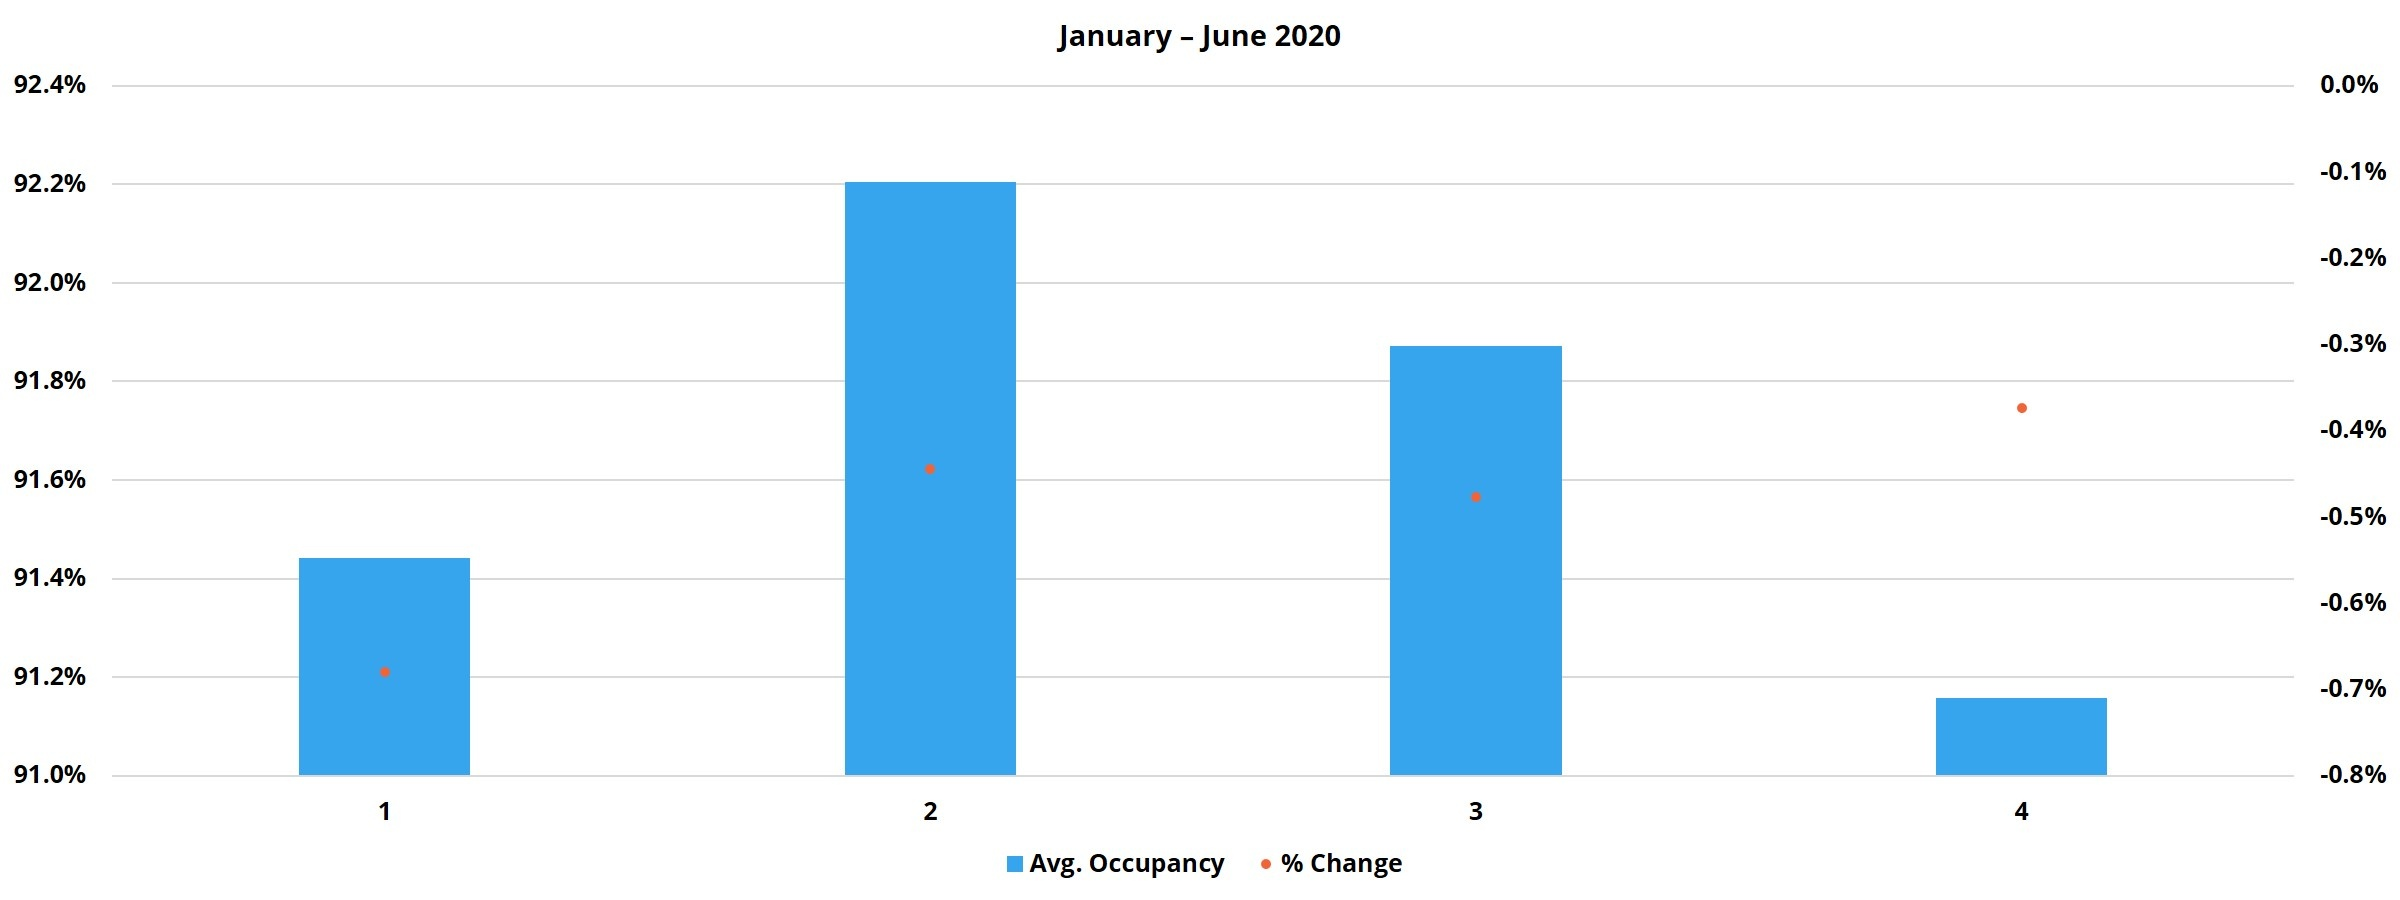 January - June 2020